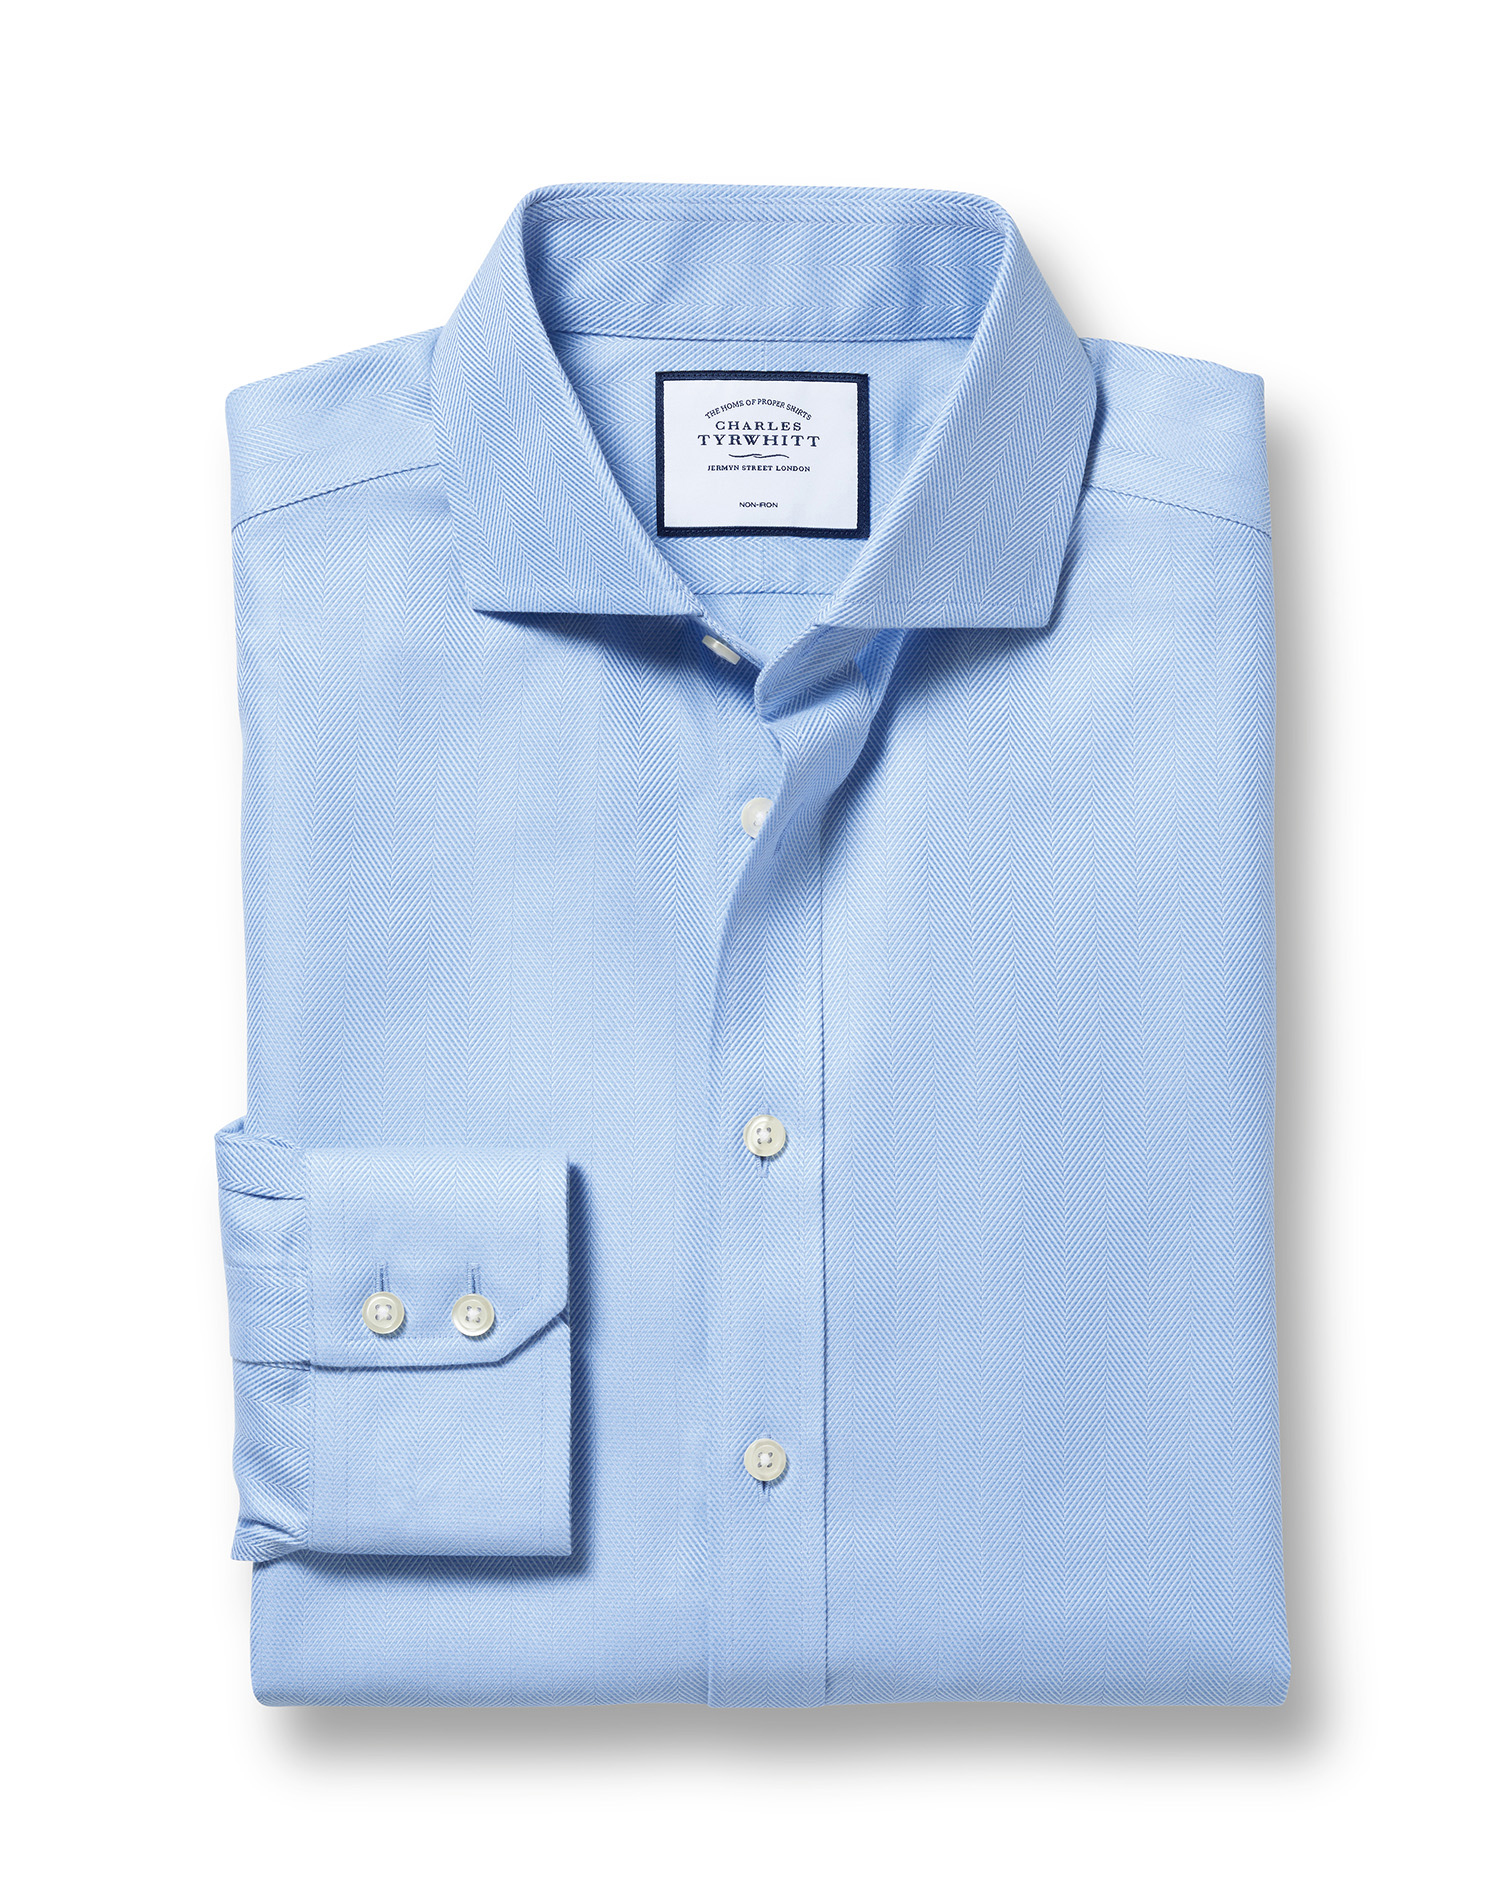 Slim Fit Non-Iron Cutaway Sky Blue Herringbone Cotton Formal Shirt Single Cuff Size 17/35 by Charles